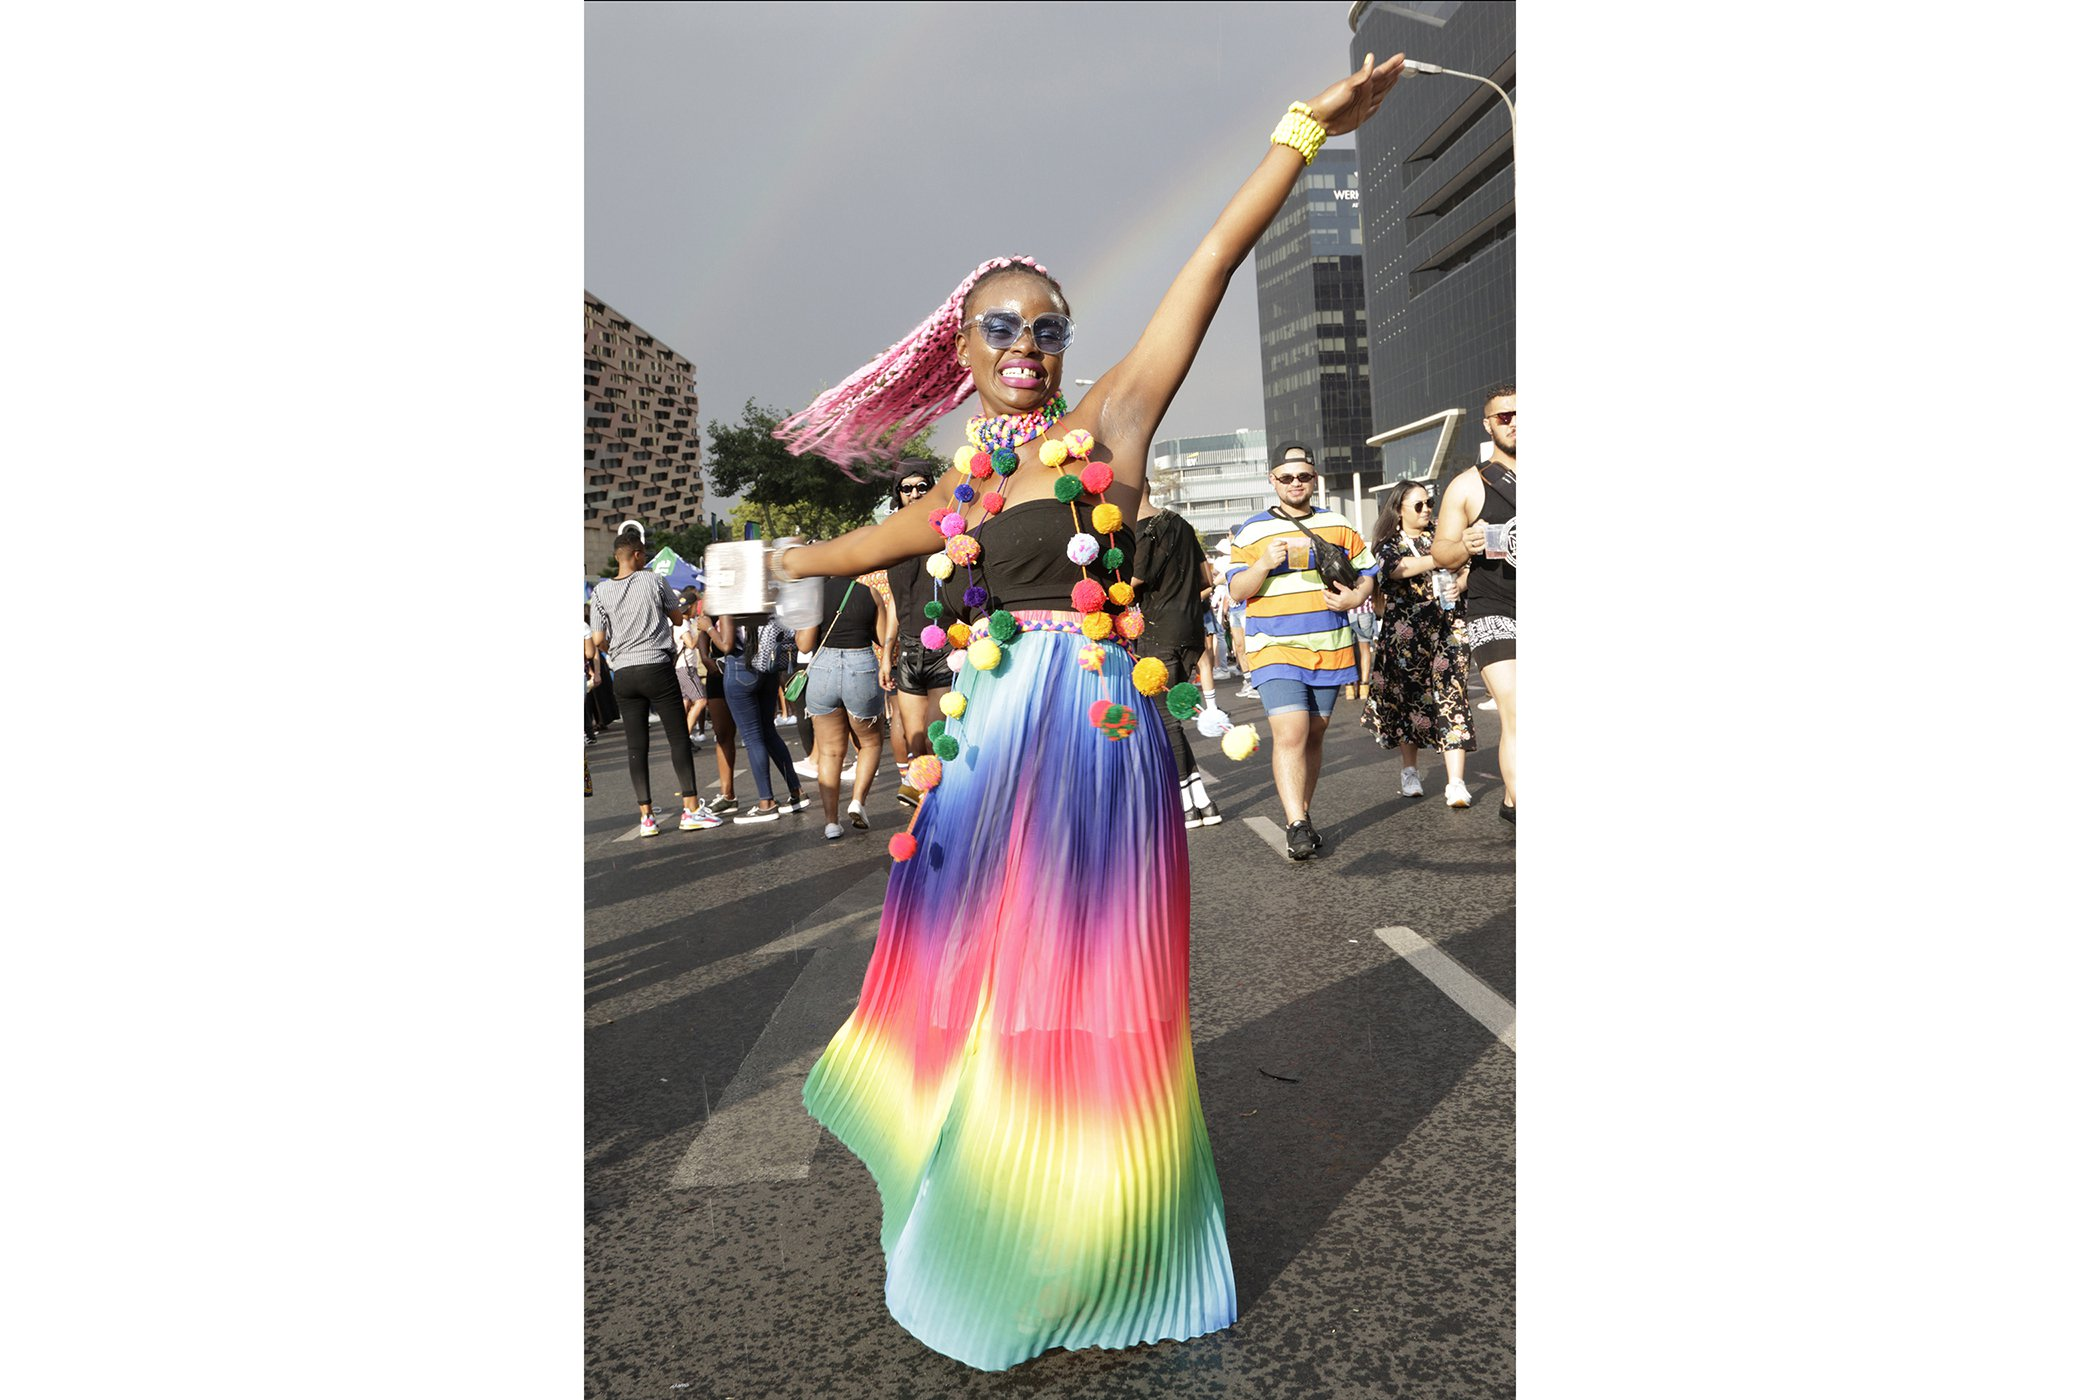 Johannesburg_Pride_LGBTQ_Noncedo Gxekwa_016-FULL.jpg